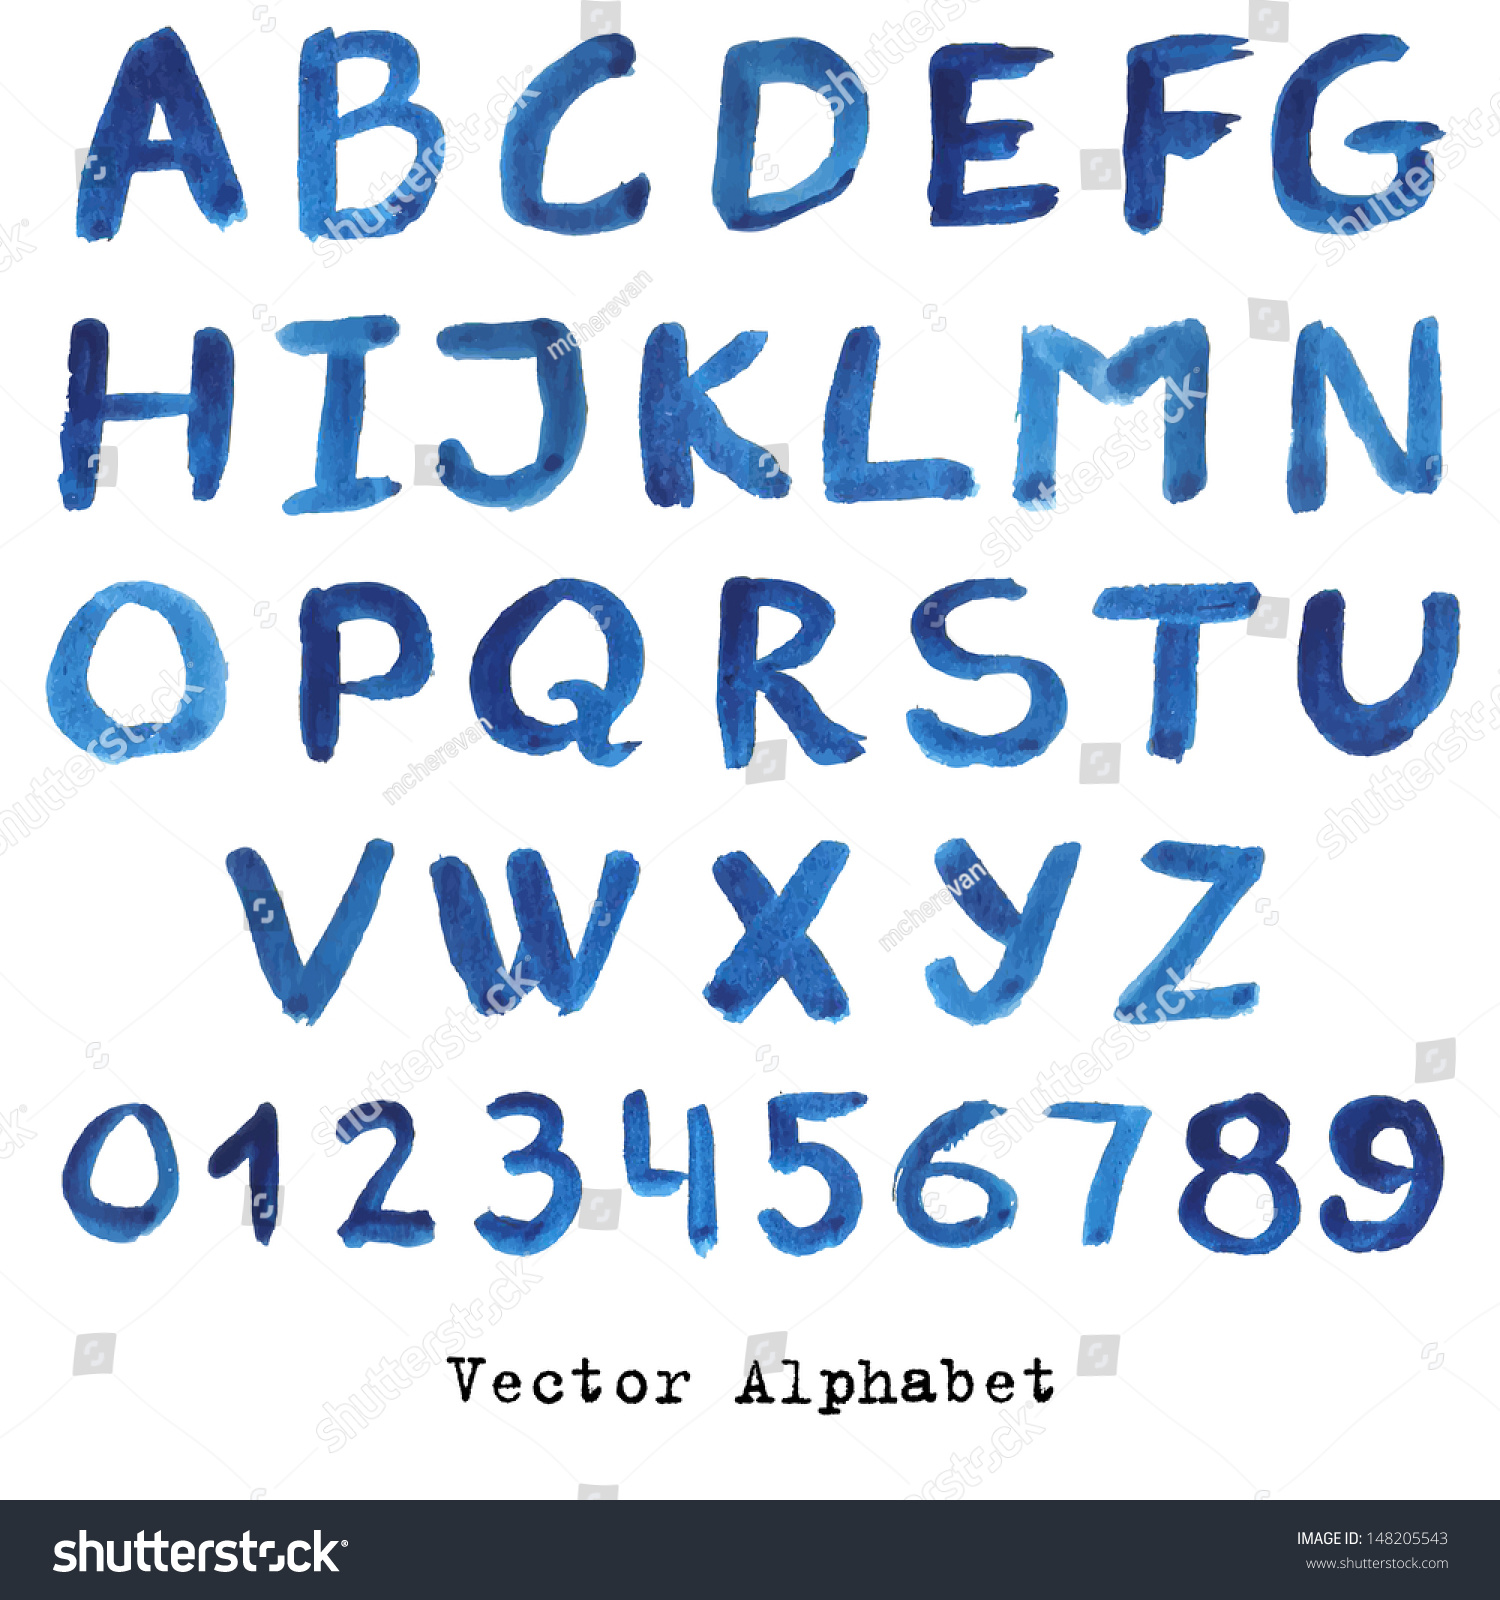 alphabet blue colors watercolor paint vectornumbers stock vector